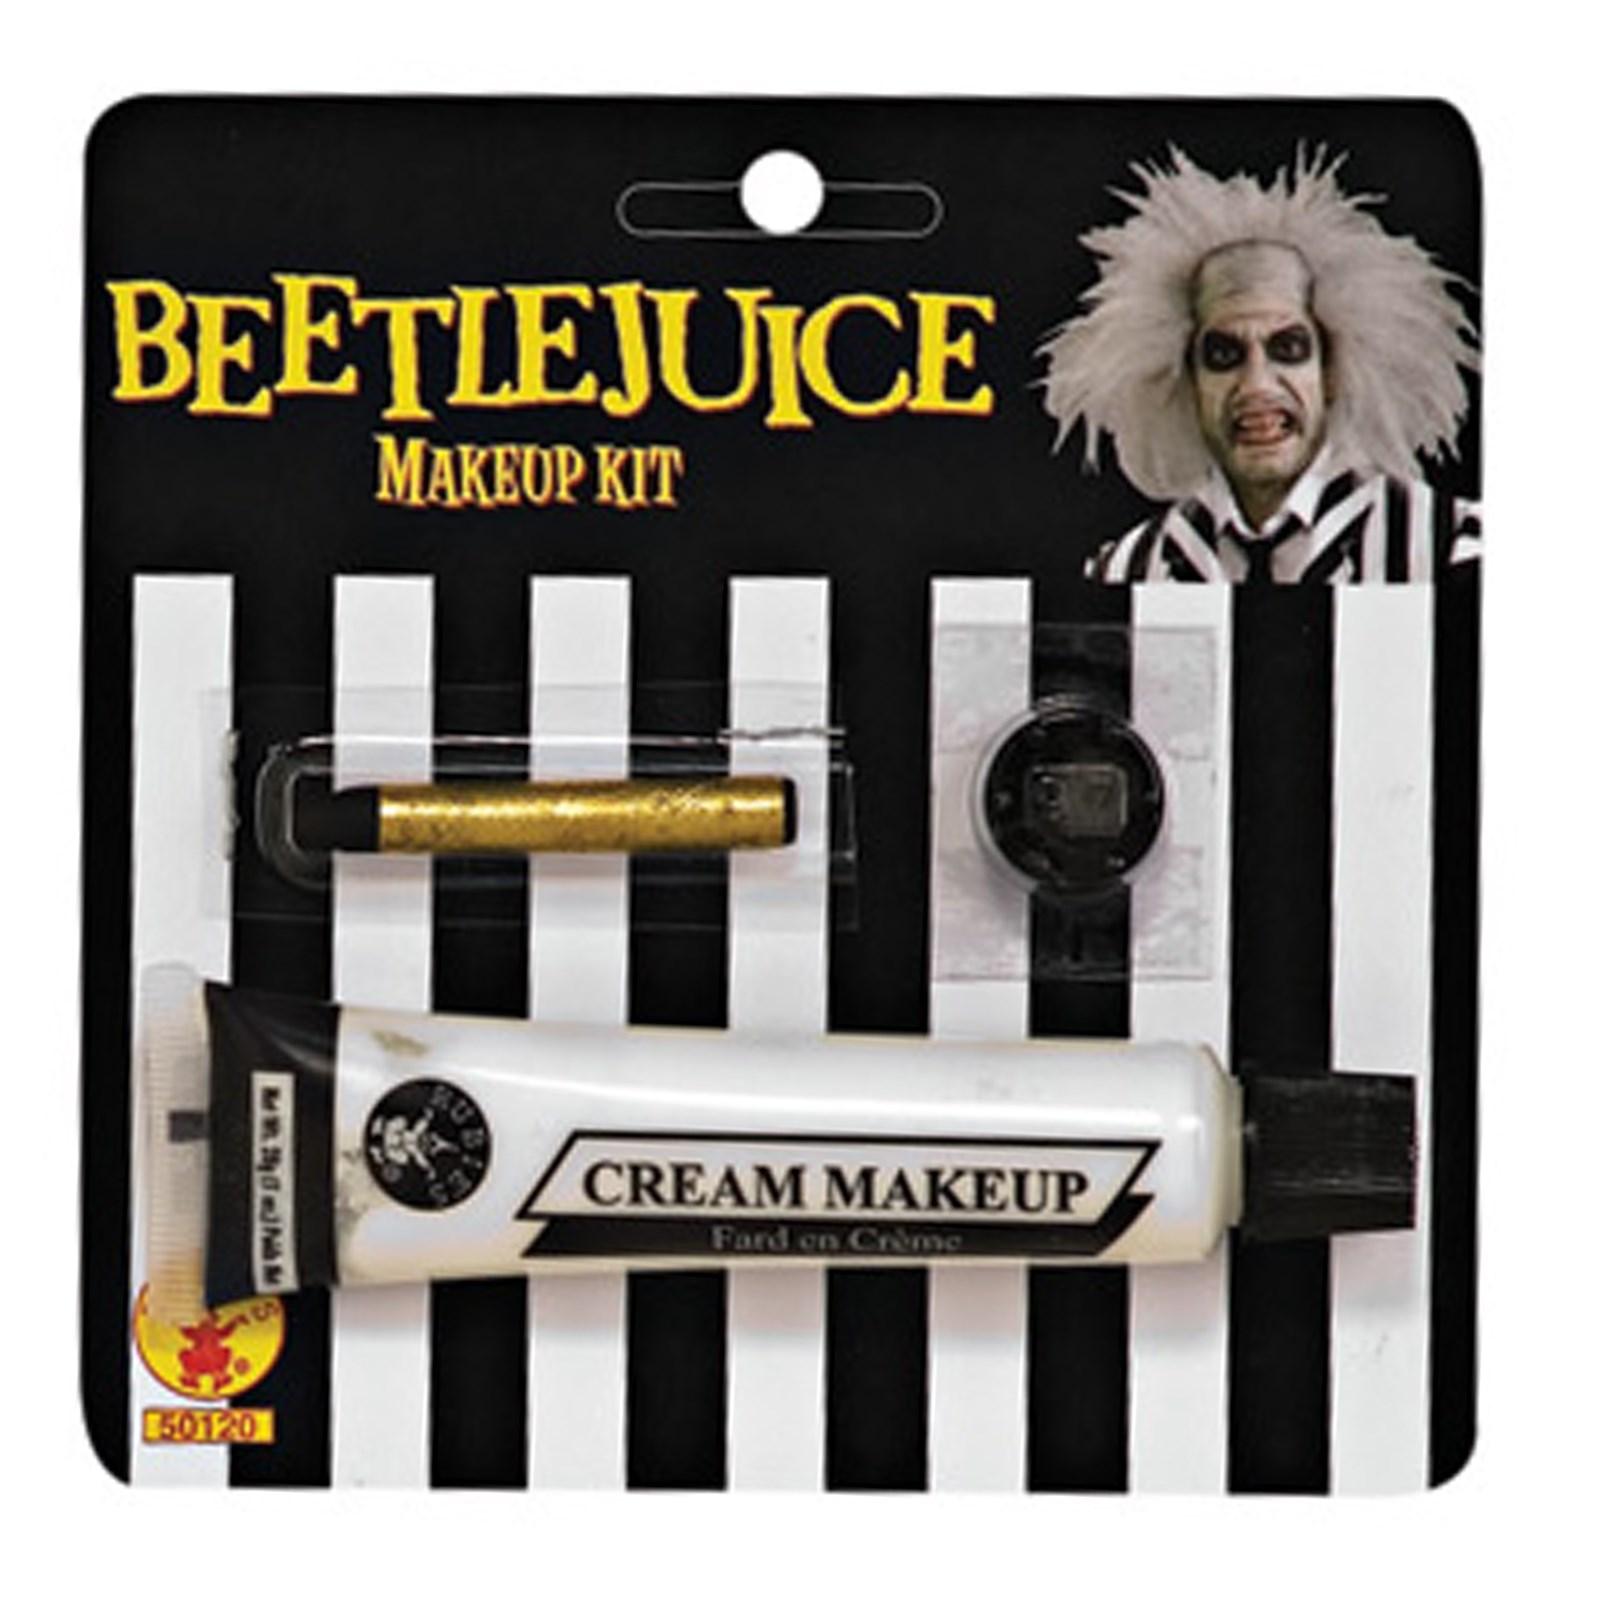 Image of Beetlejuice Makeup Kit